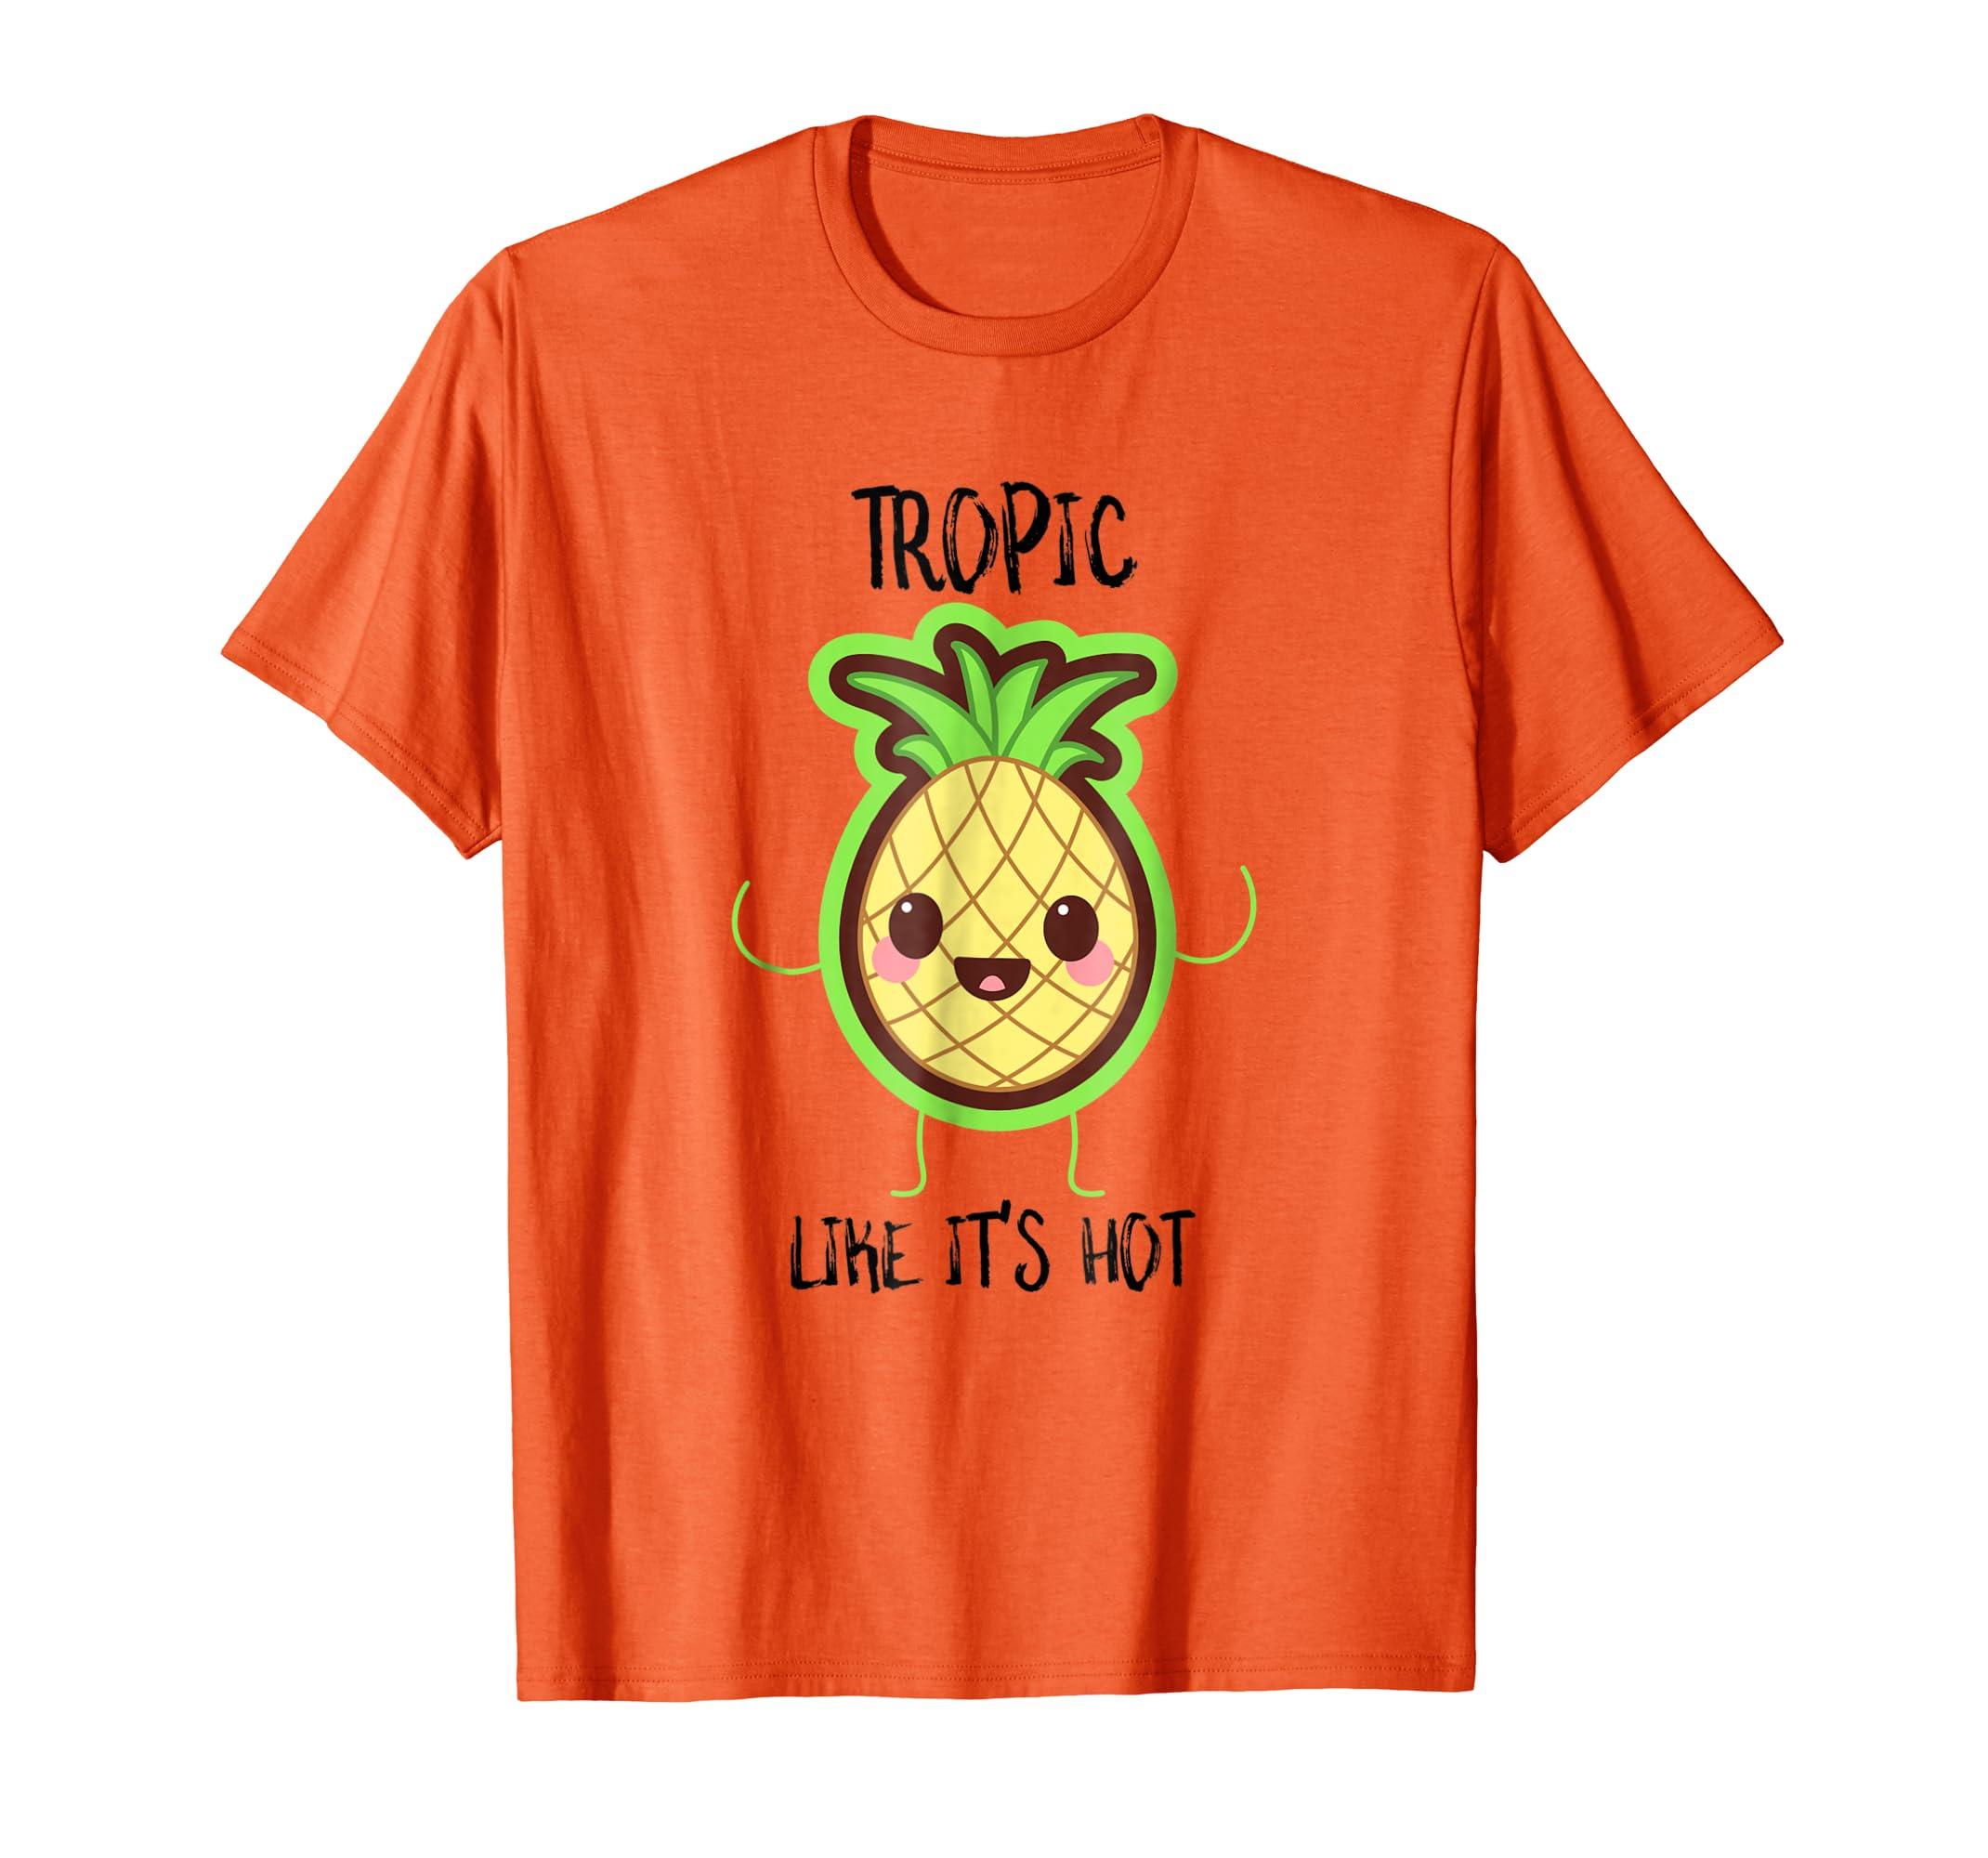 48197f6be Amazon.com: Pineapple Cute Kawaii Funny Pun Tropic Like It's Hot Shirt:  Clothing